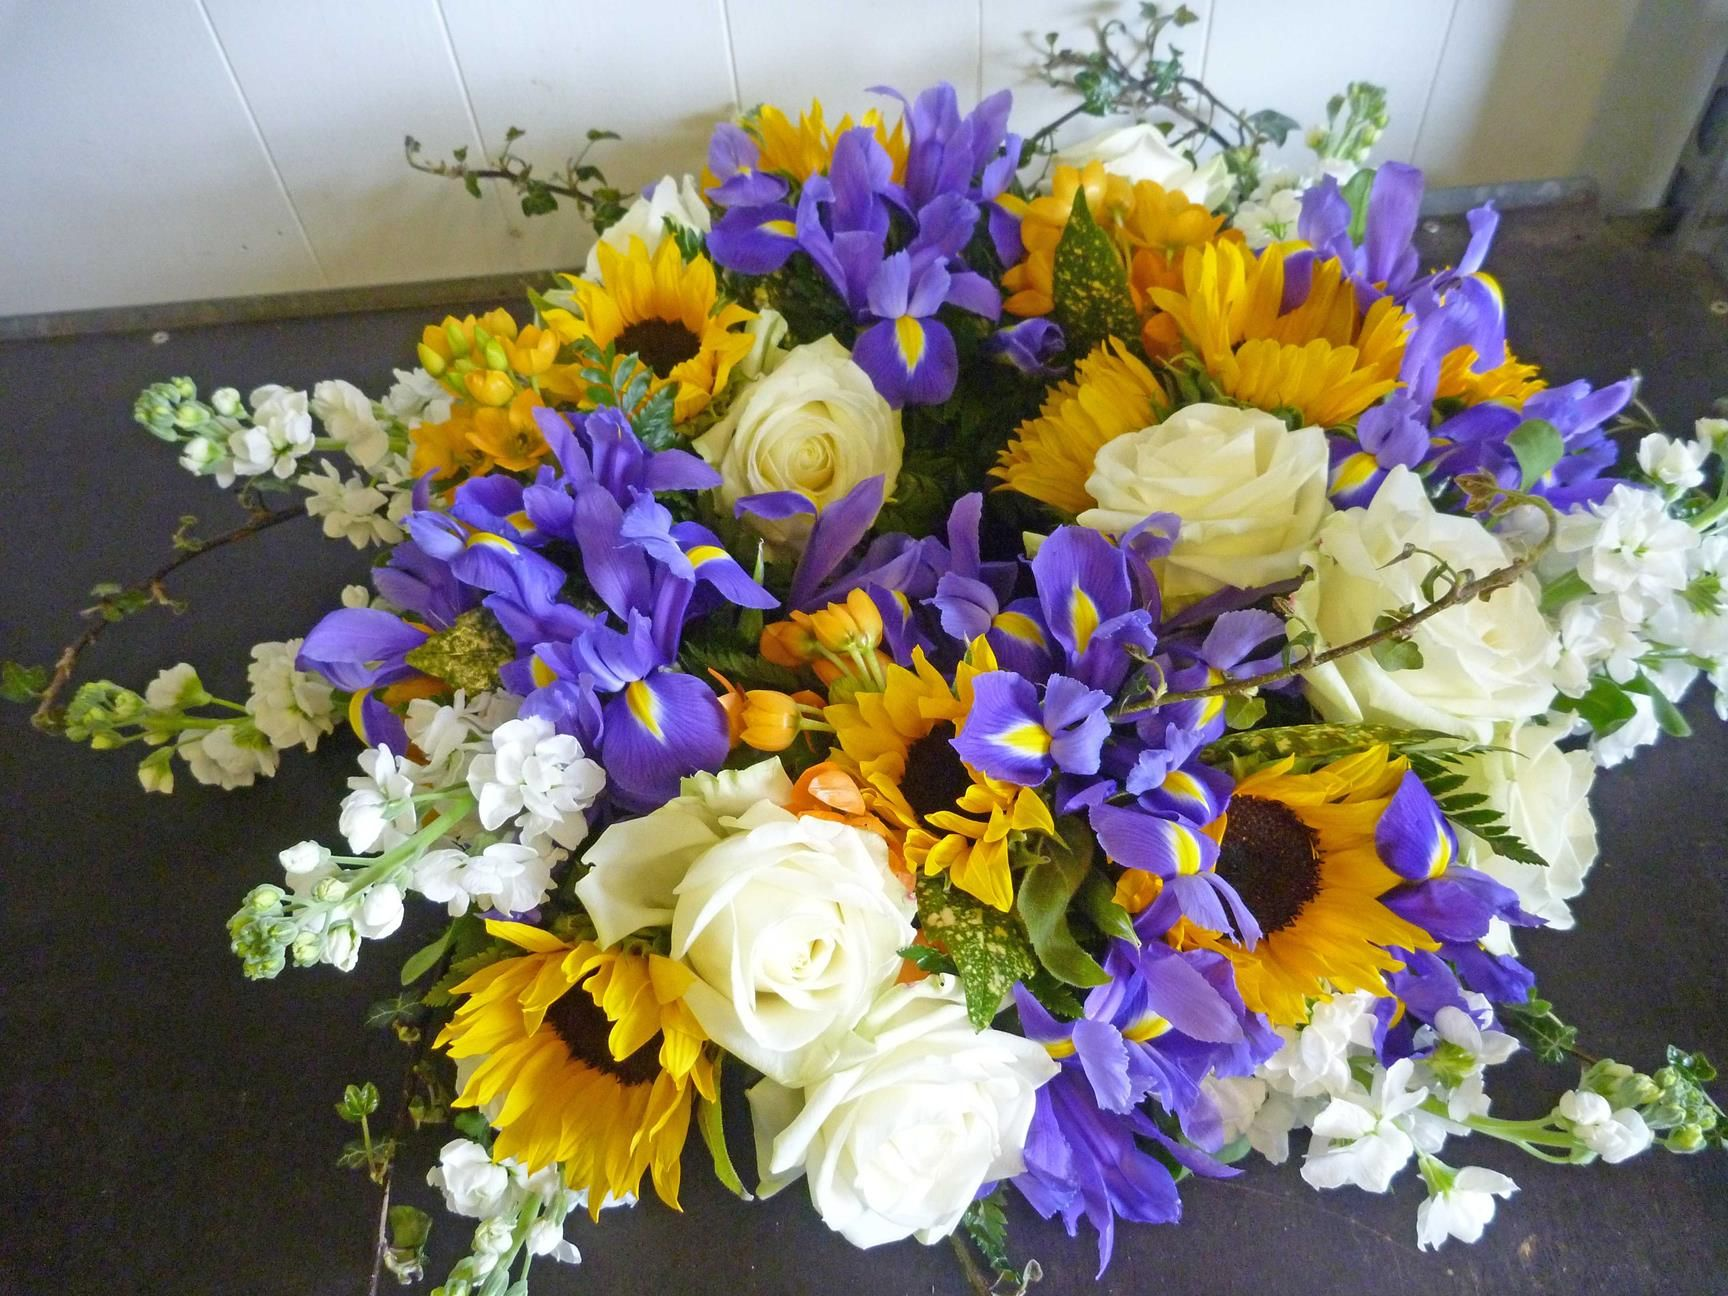 58mt White Dendrobium Orchids Sunflowers White Roses Purple Iris